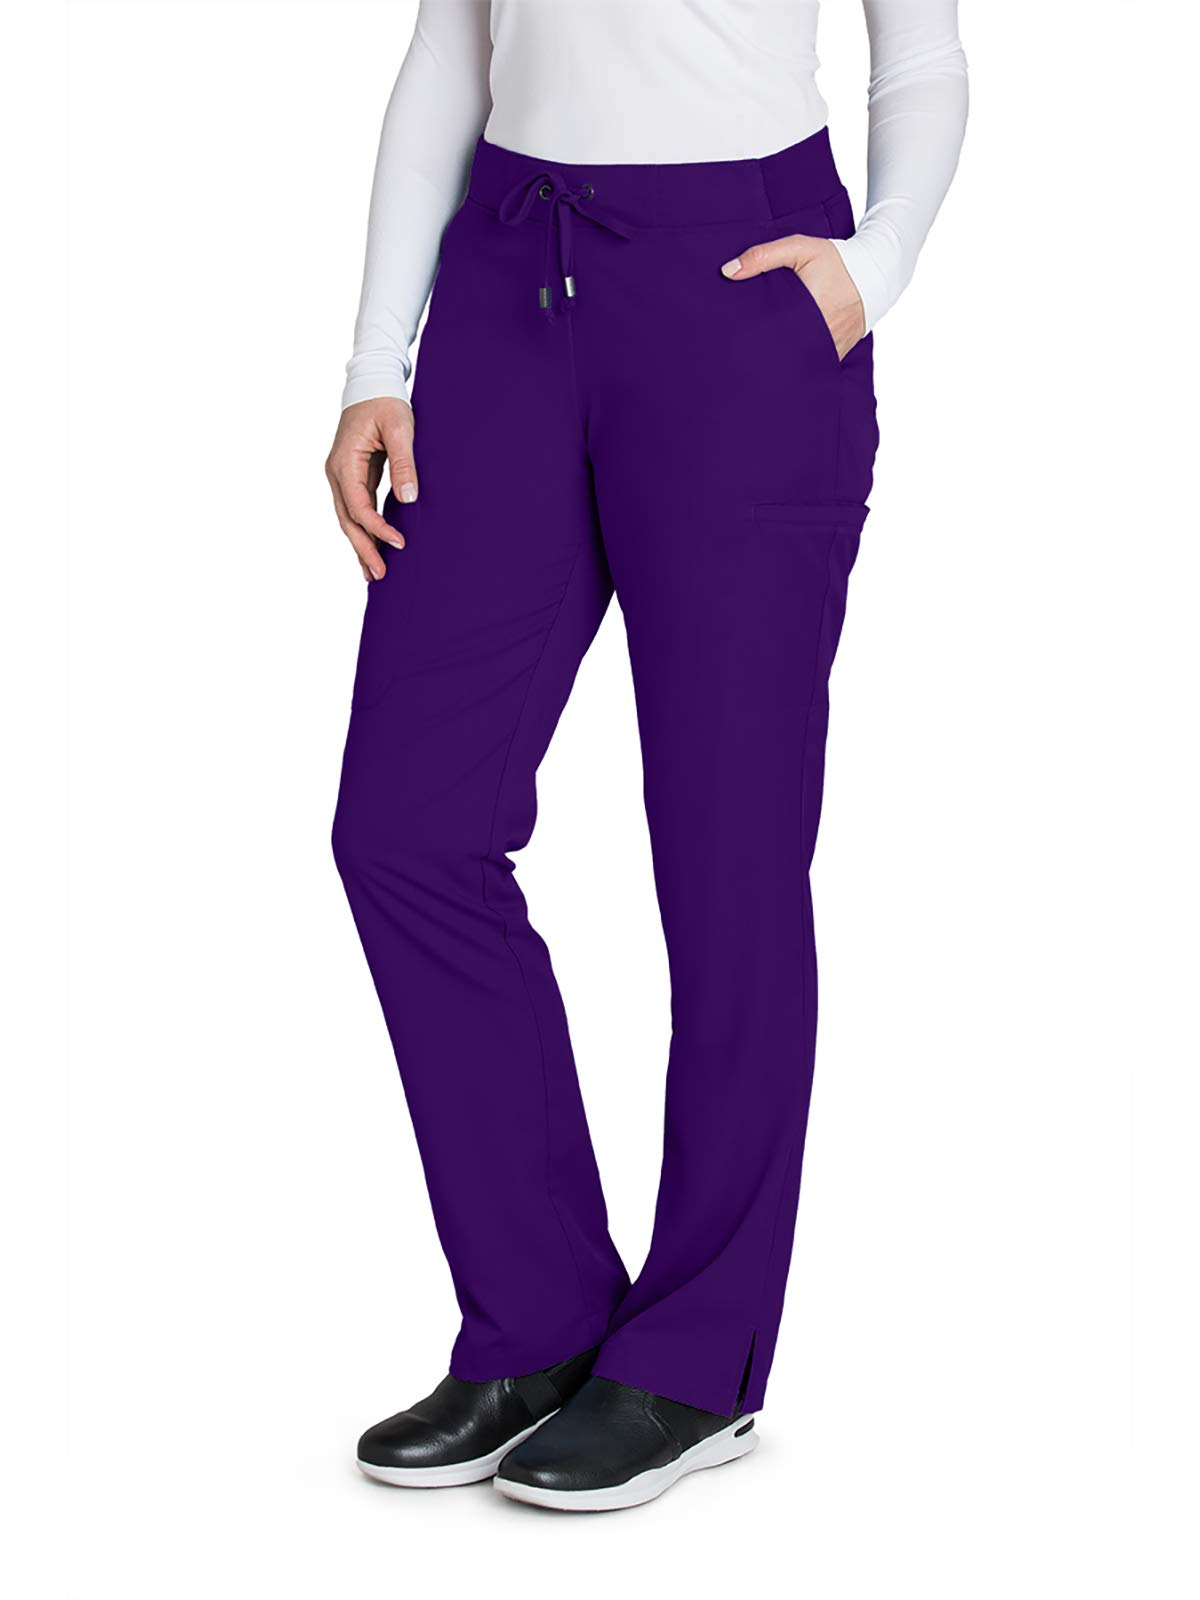 Grey's Anatomy 4277 Women's 6 Pocket Tie Front Scrub Pant Vivid Violet XXS